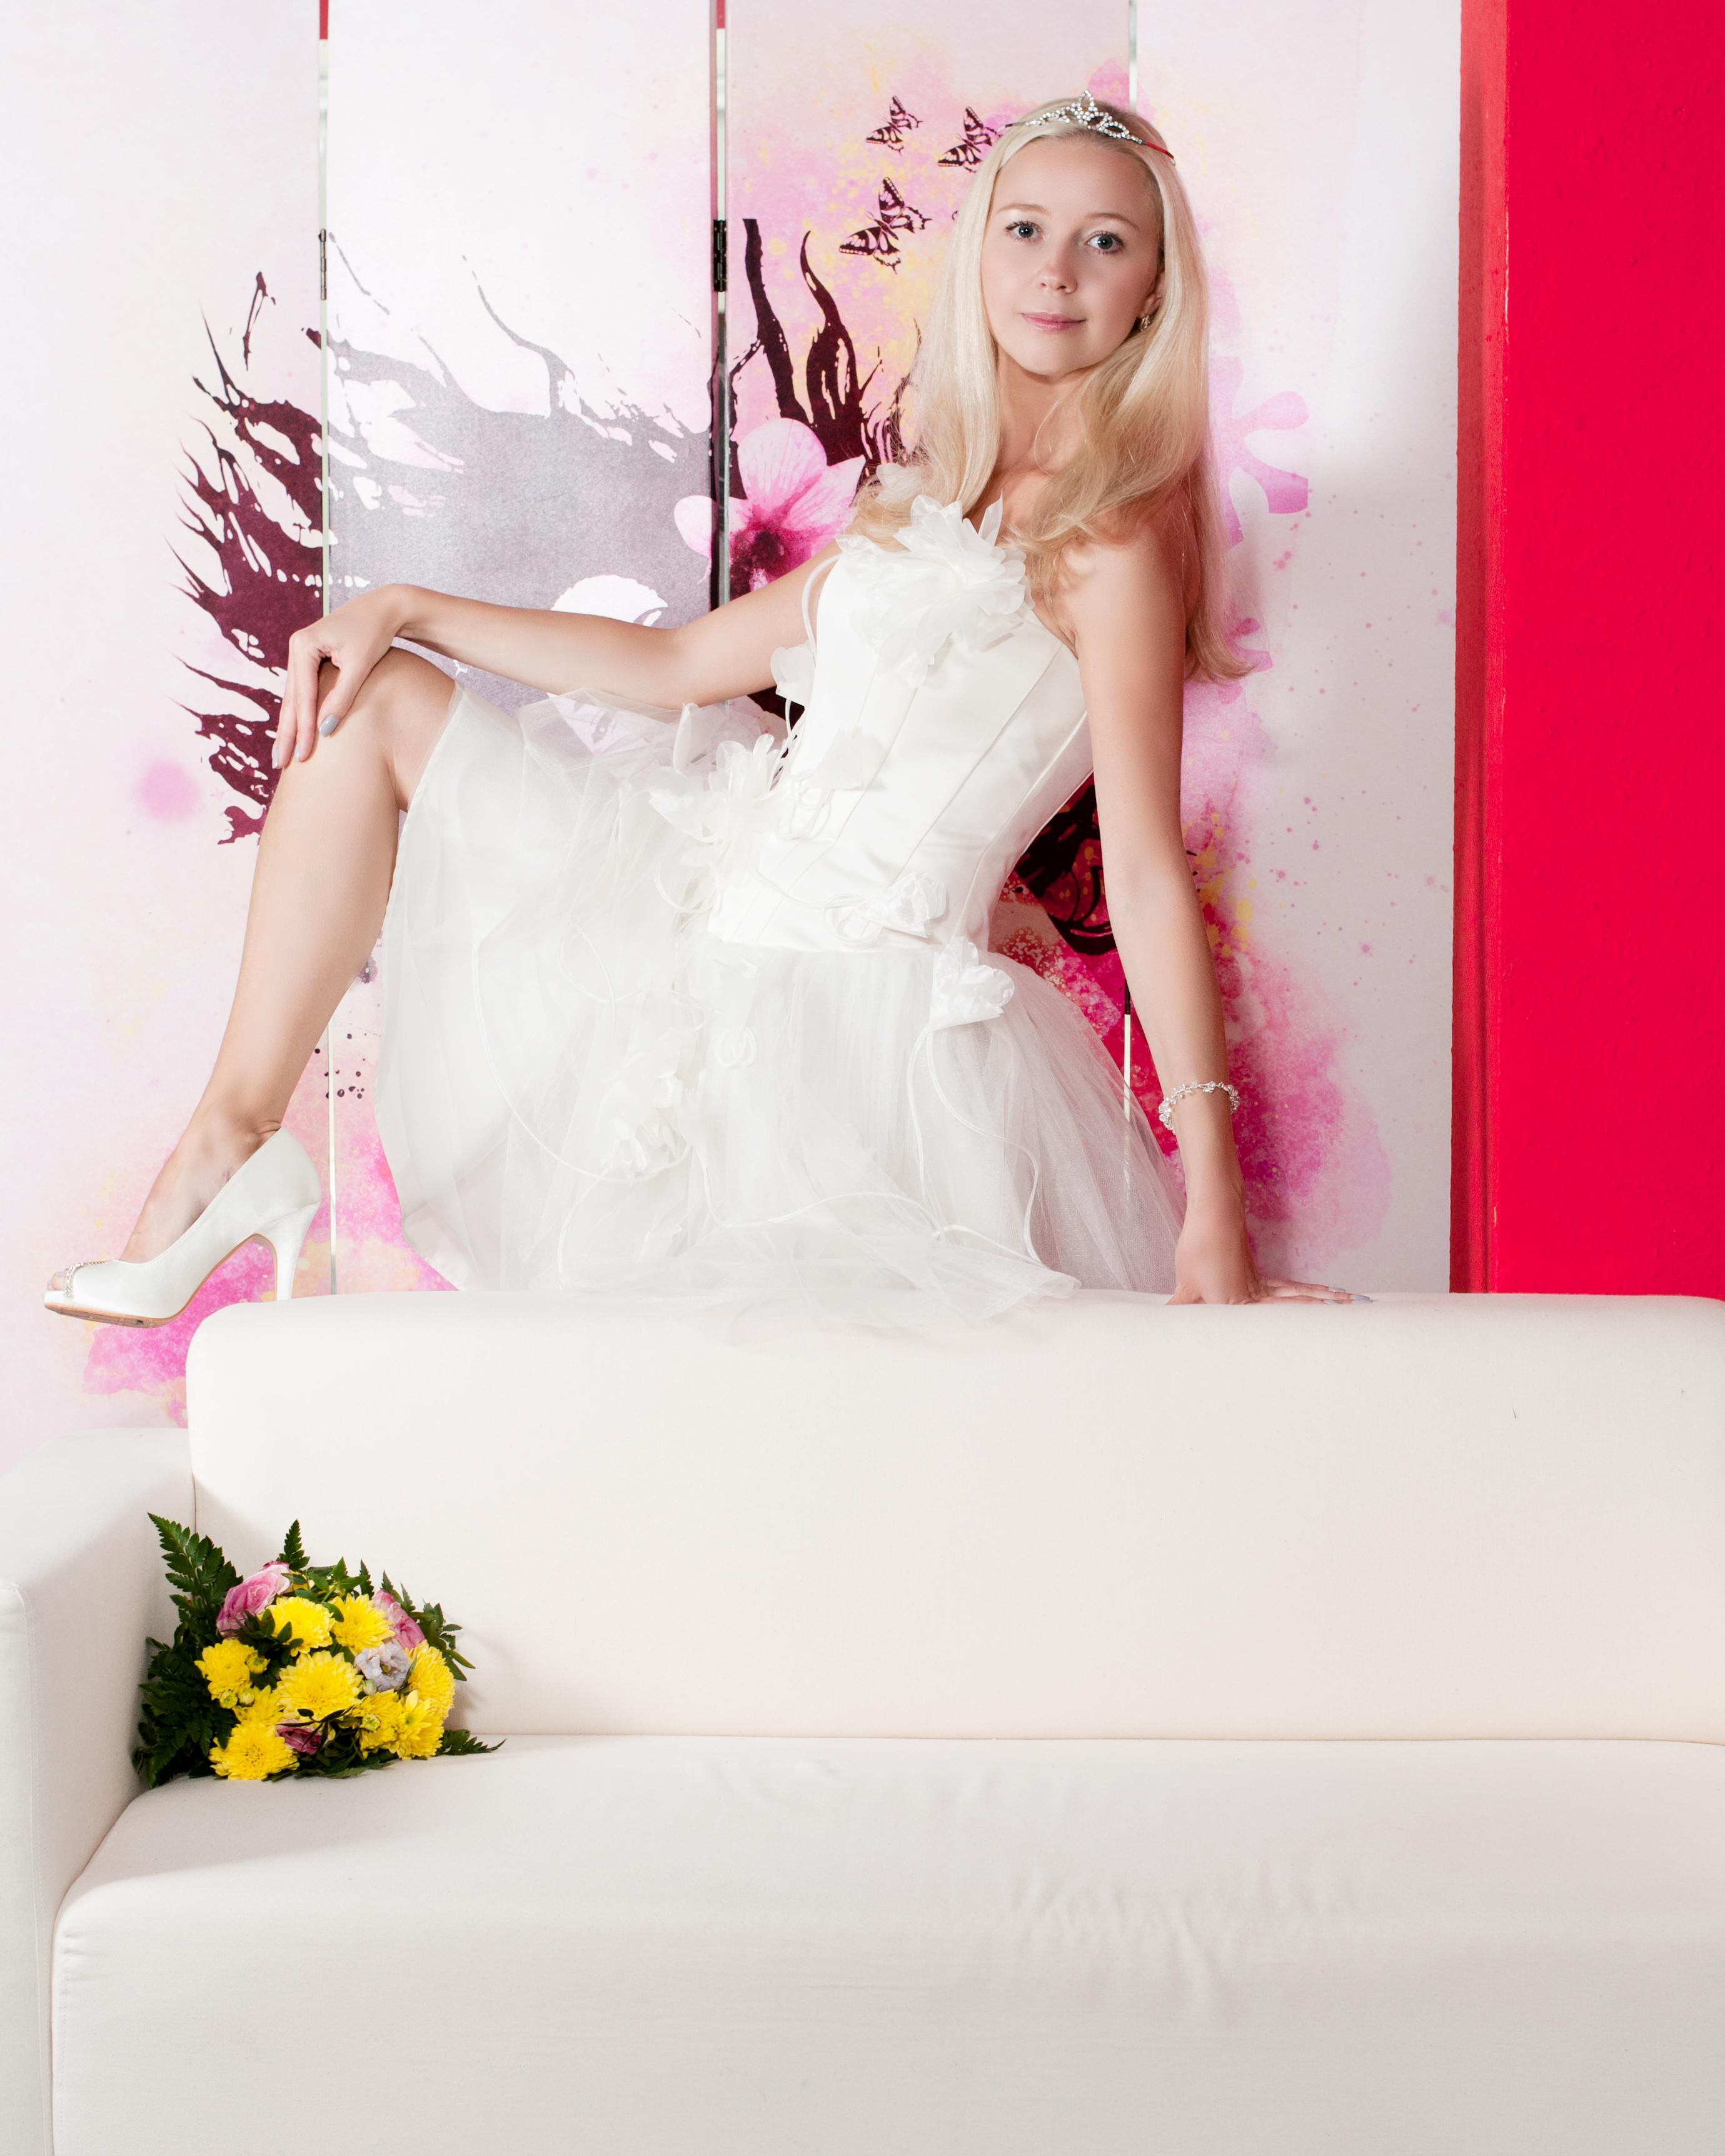 Berühmt Brautkleid Verleih Mn Fotos - Brautkleider Ideen - cashingy.info